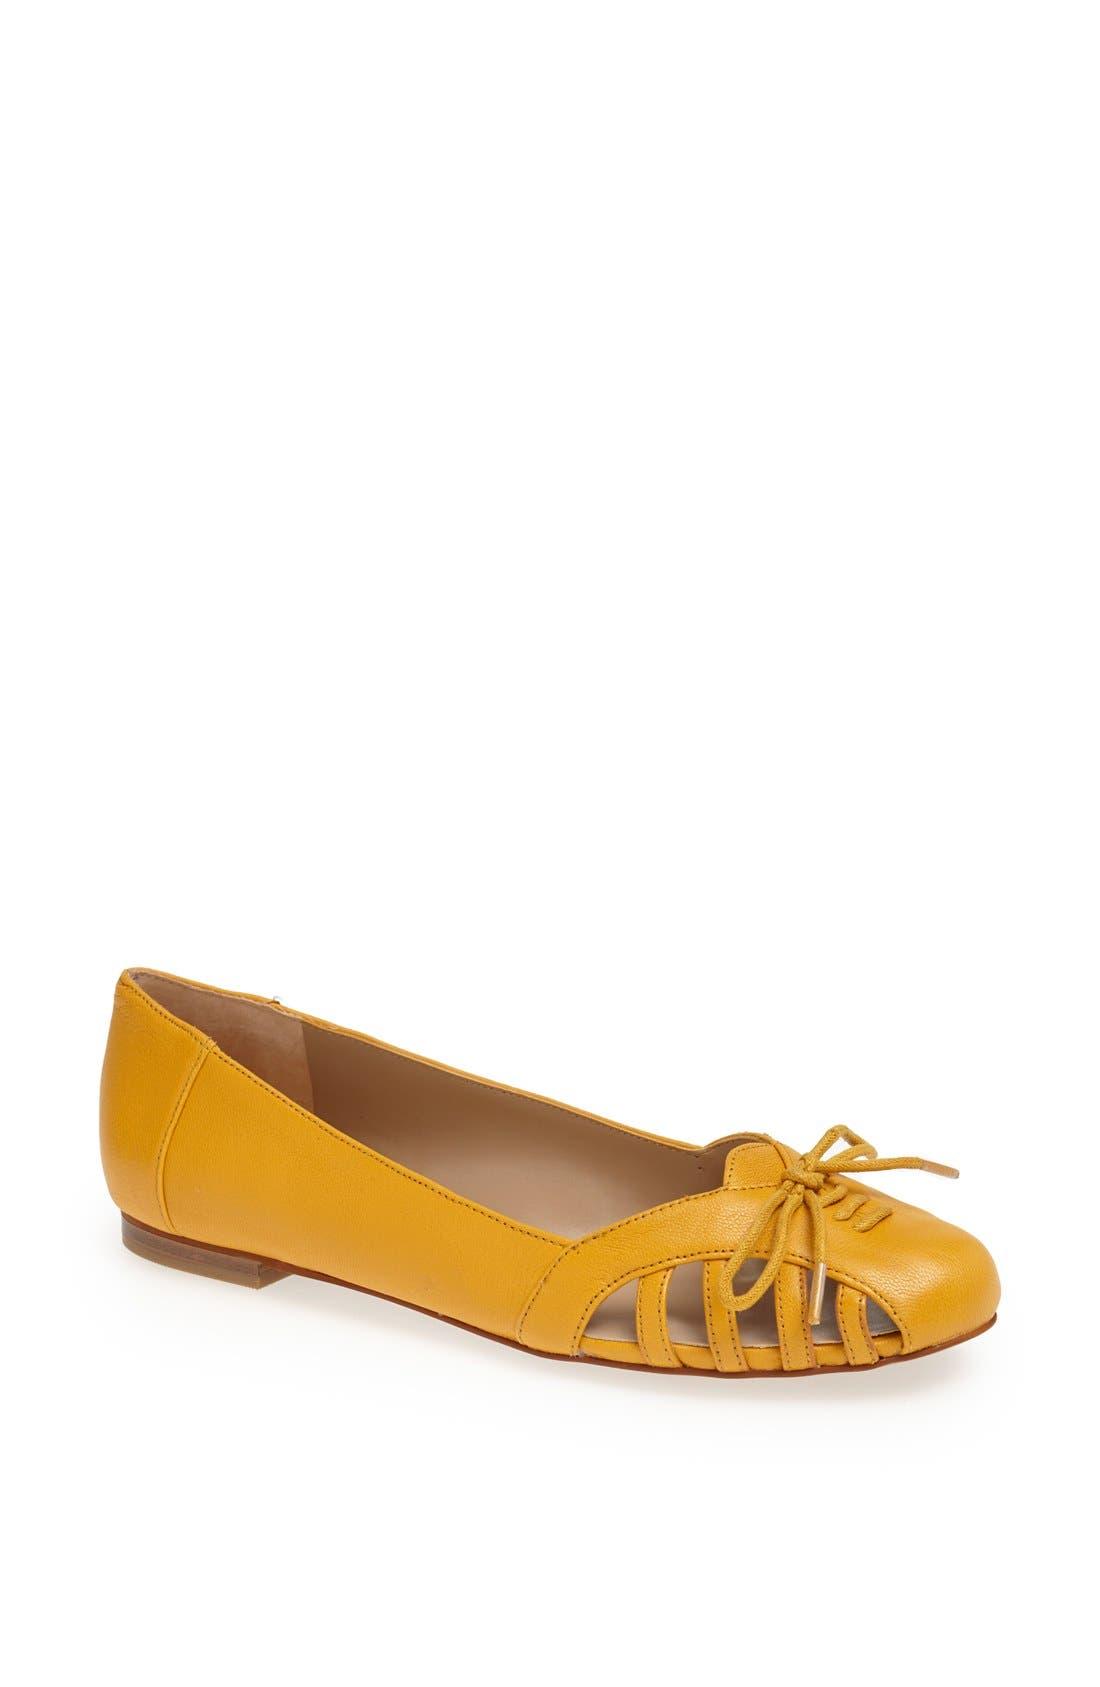 Main Image - Sole Society 'Meredithe' Leather Flat